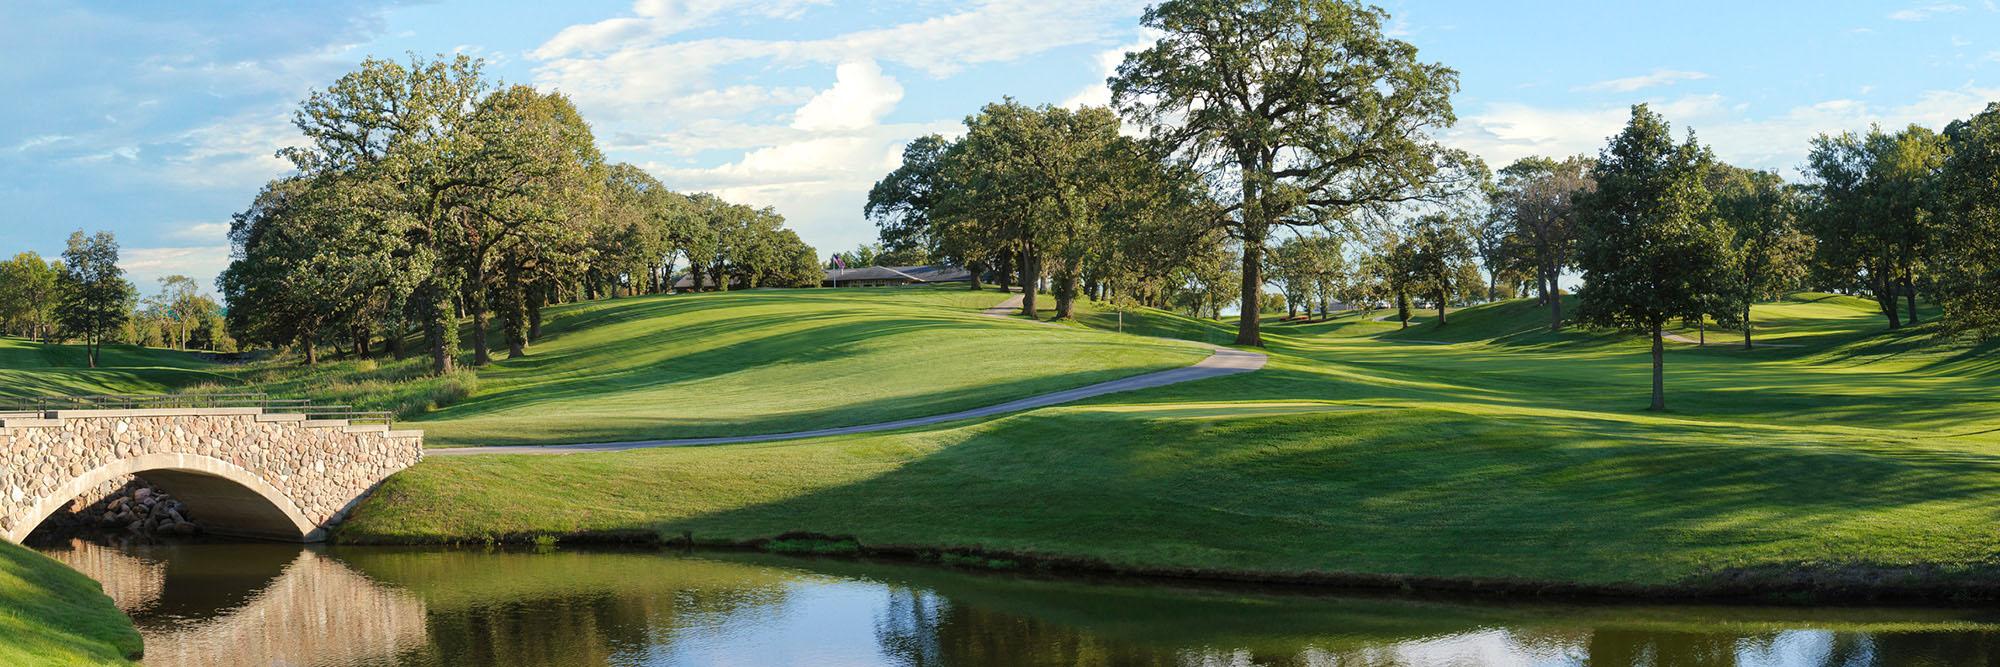 Golf Course Image - Wakonda No. 18